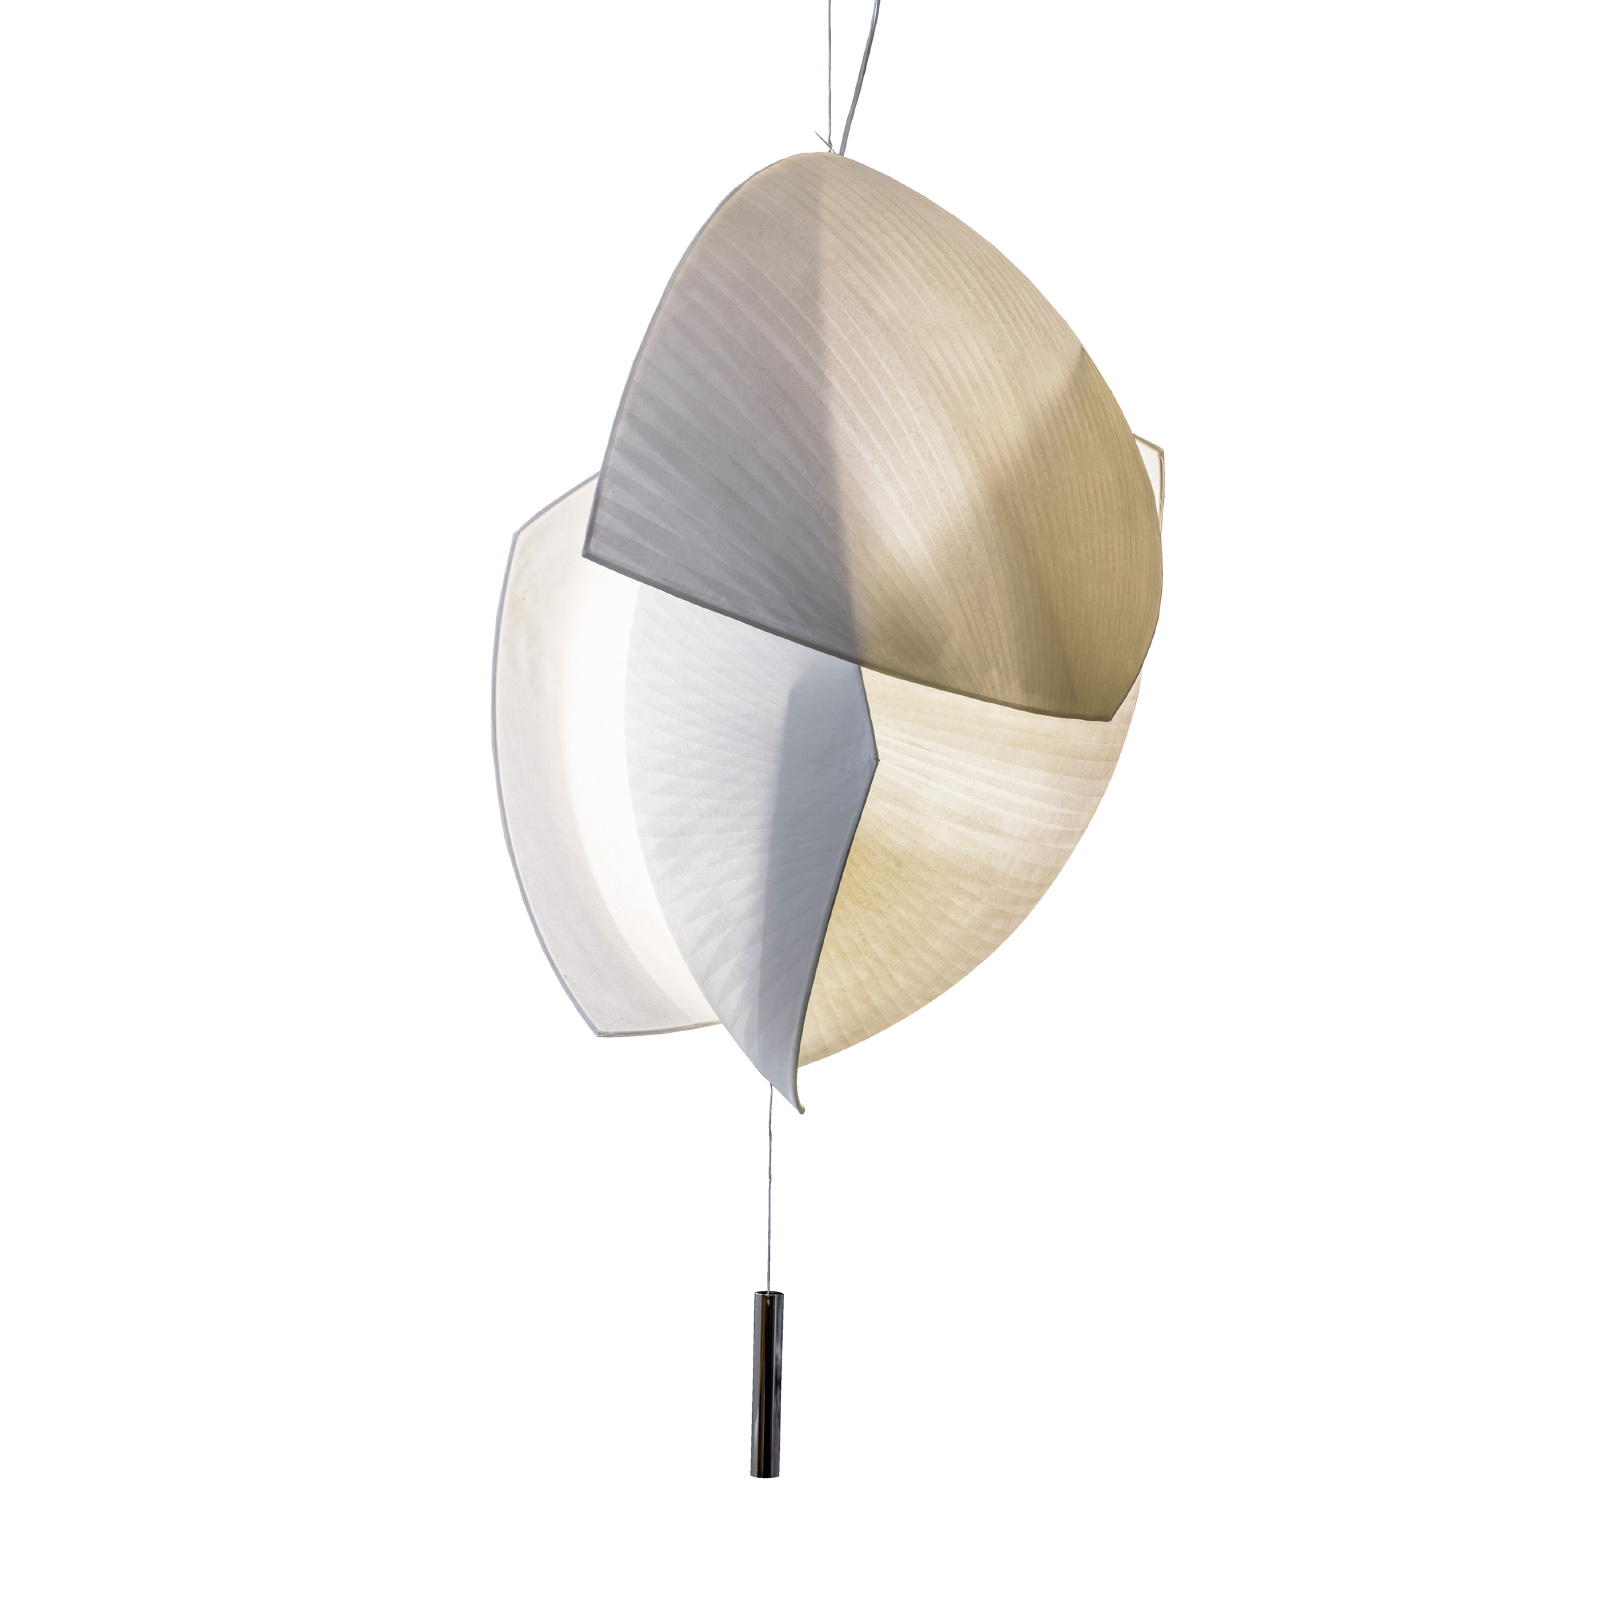 Grok Voiles suspension LED 95x70cm, dimmable 1-10V